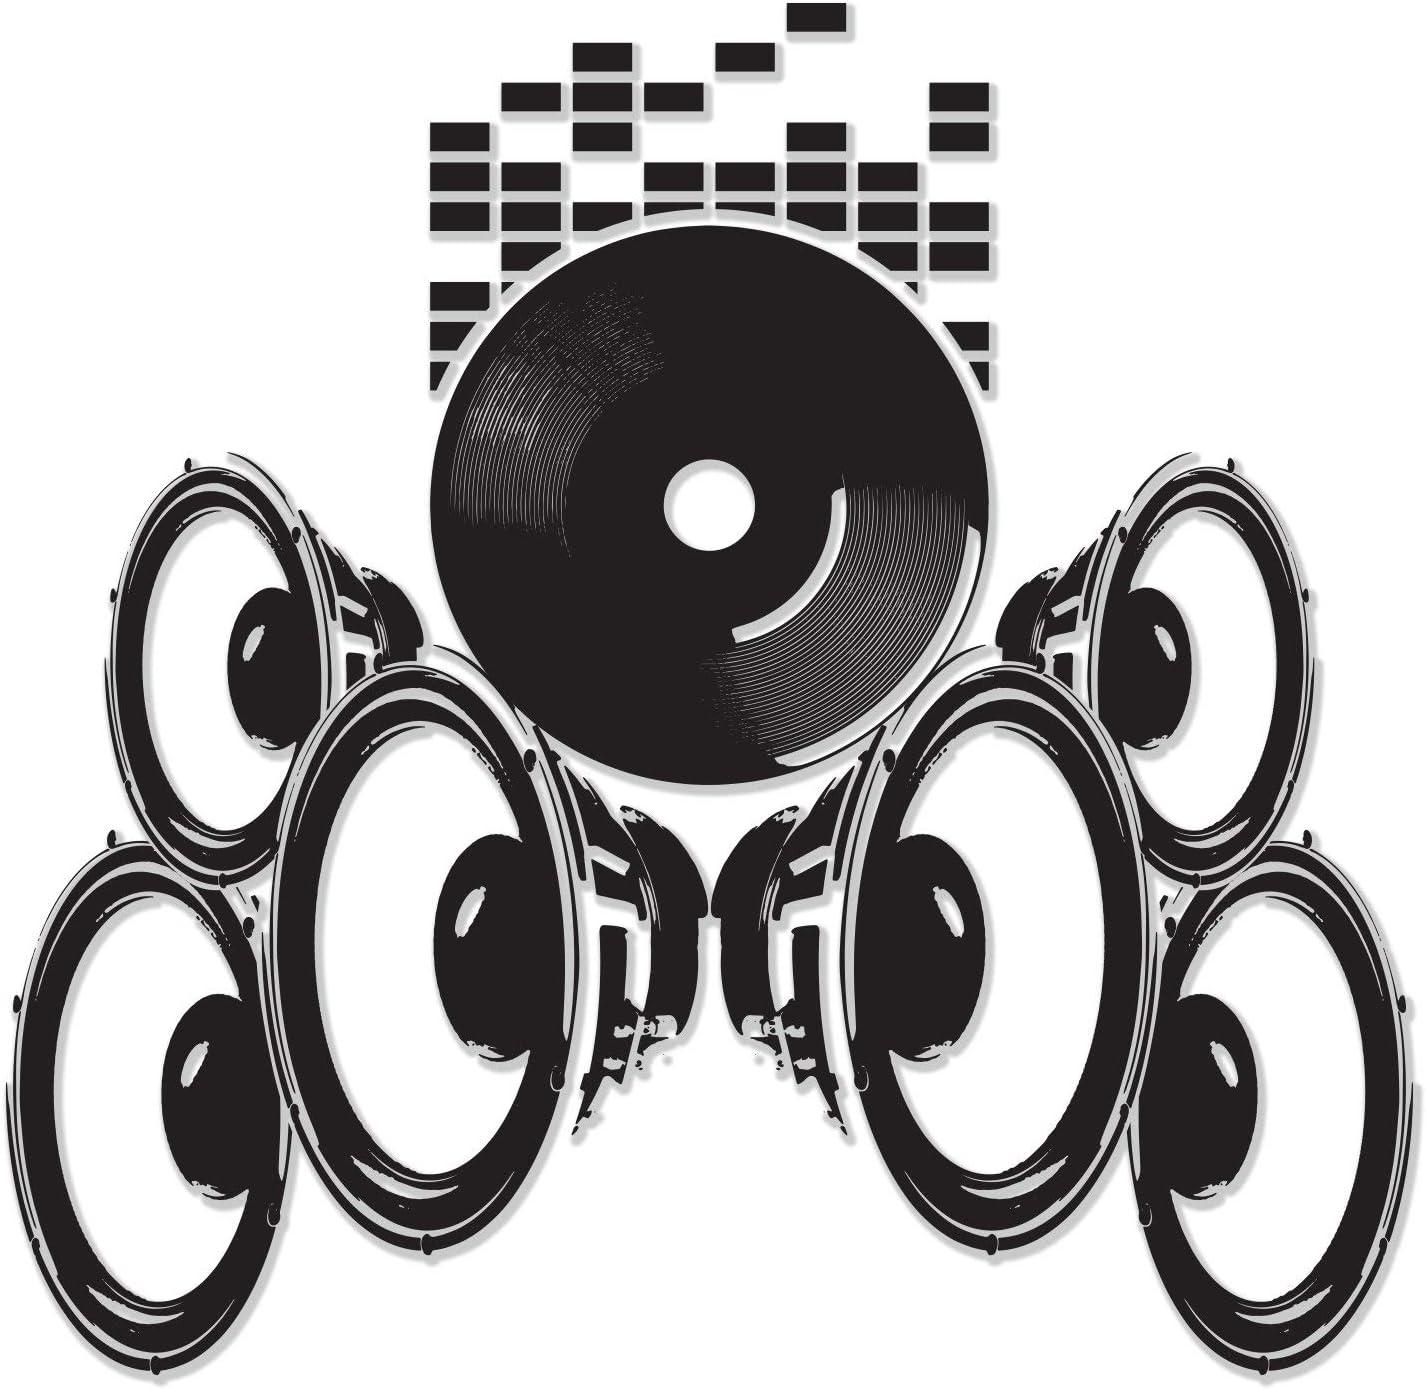 Music Speakers Wall Vinyl Sticker Oakland Mall Removab Art Radio - Max 56% OFF Waterproof